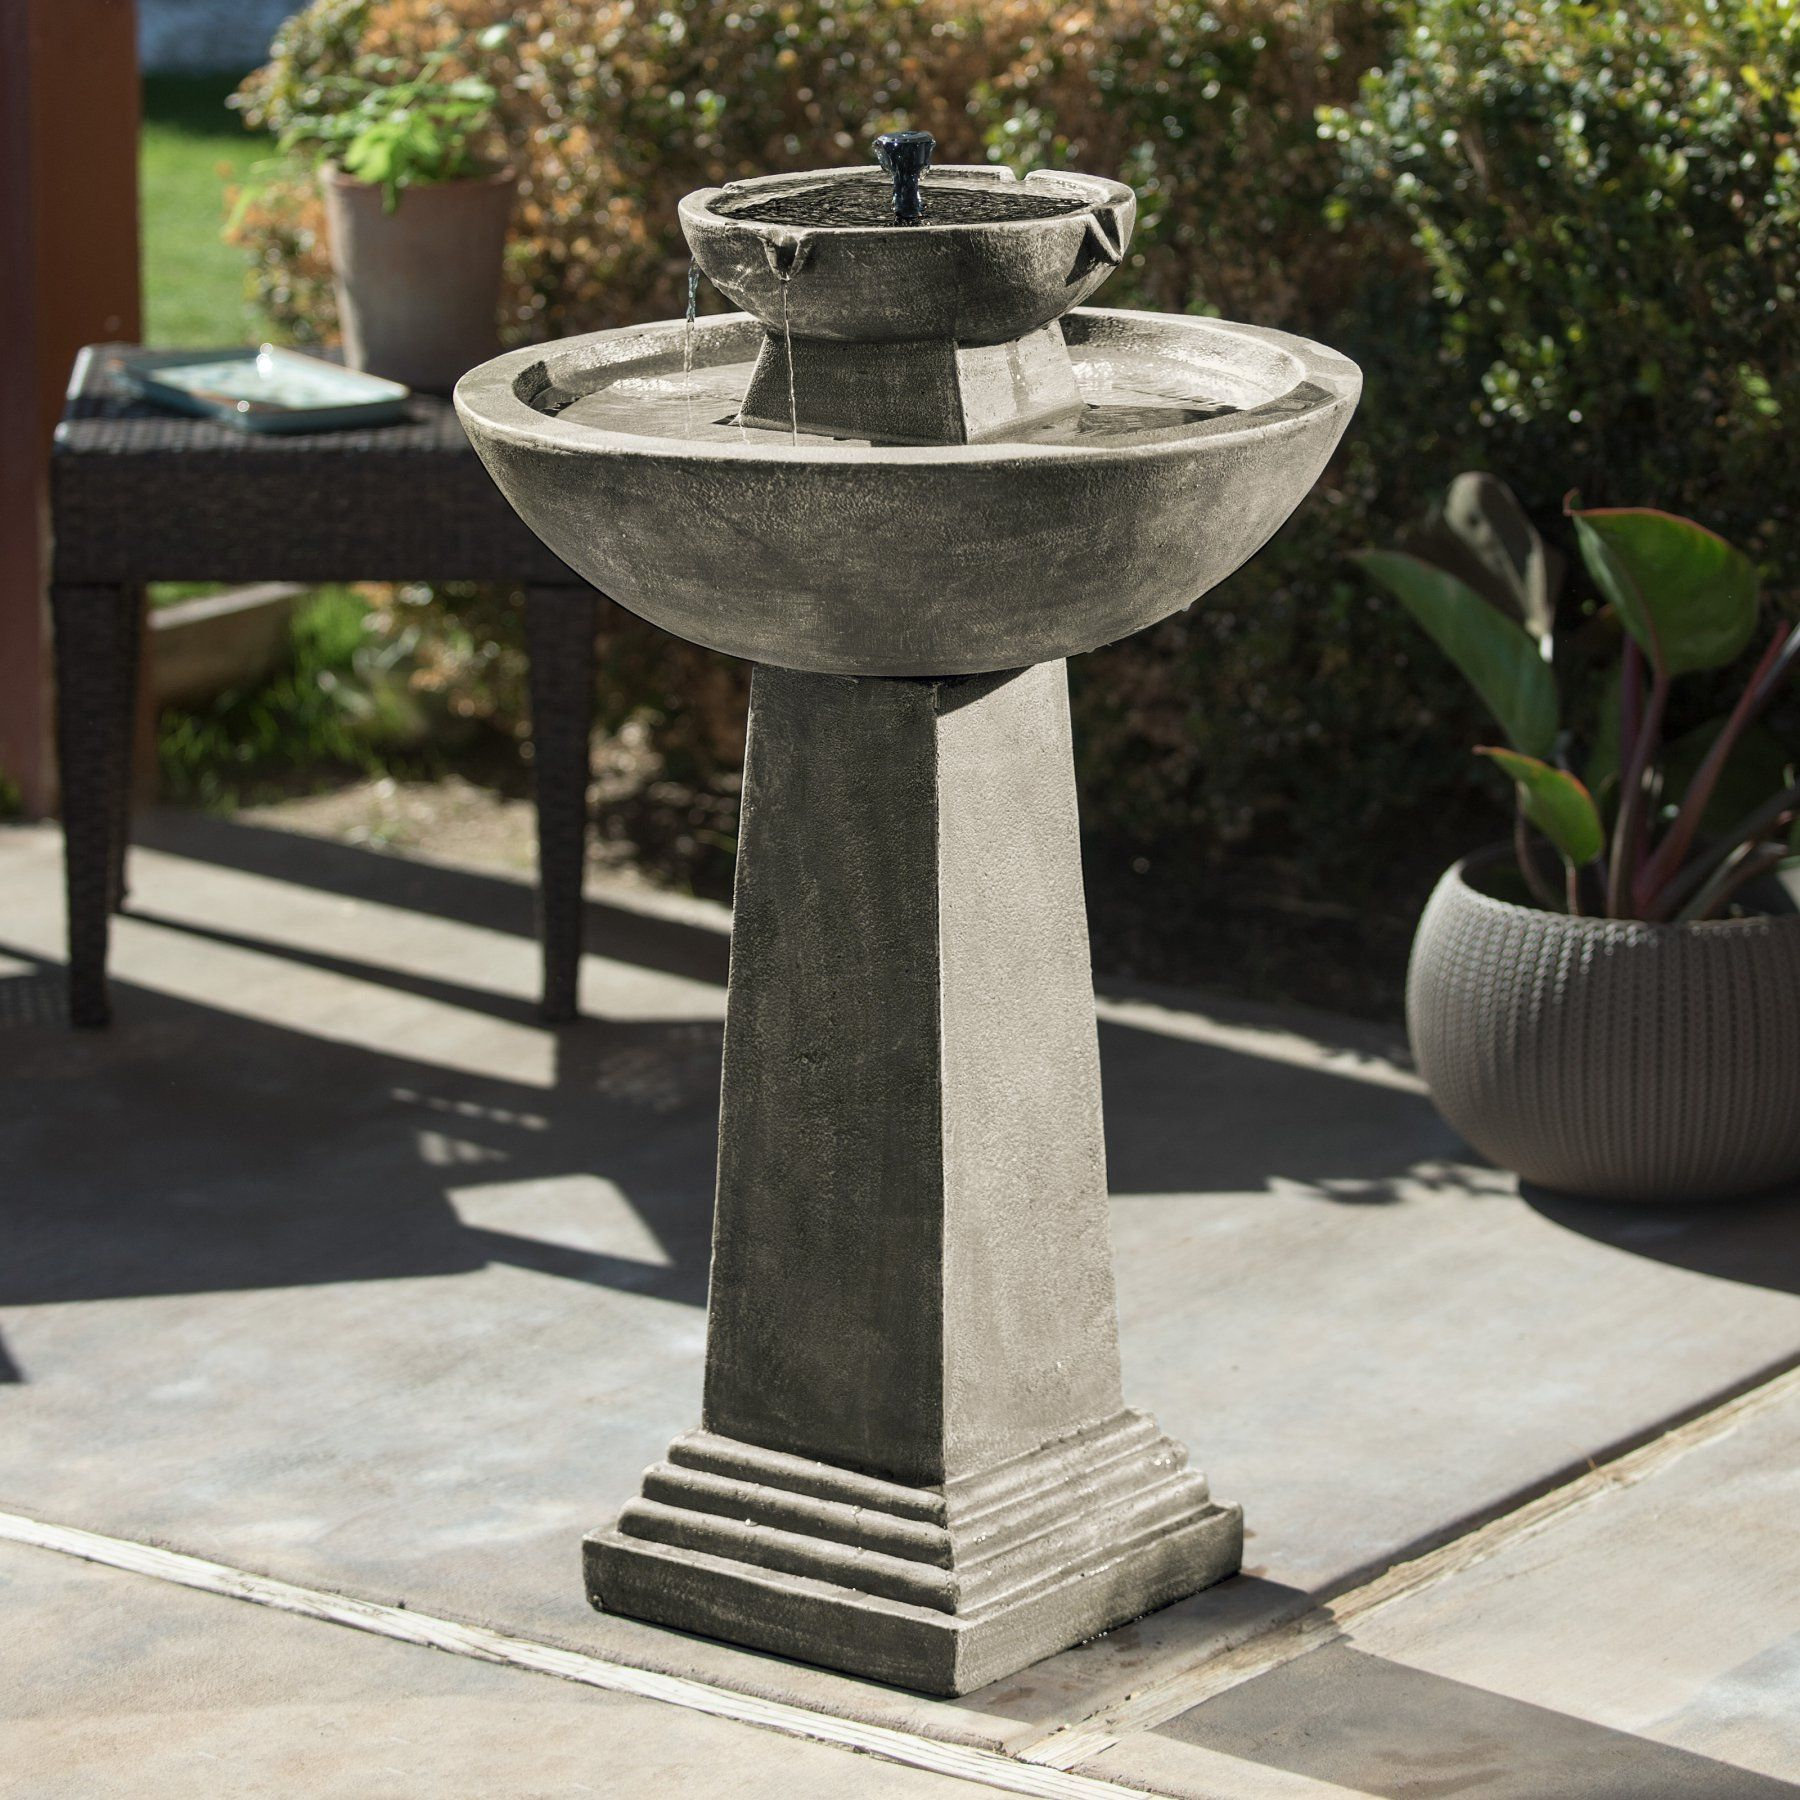 Smart Solar Gardens 2 Tier Solar On Demand Fountain